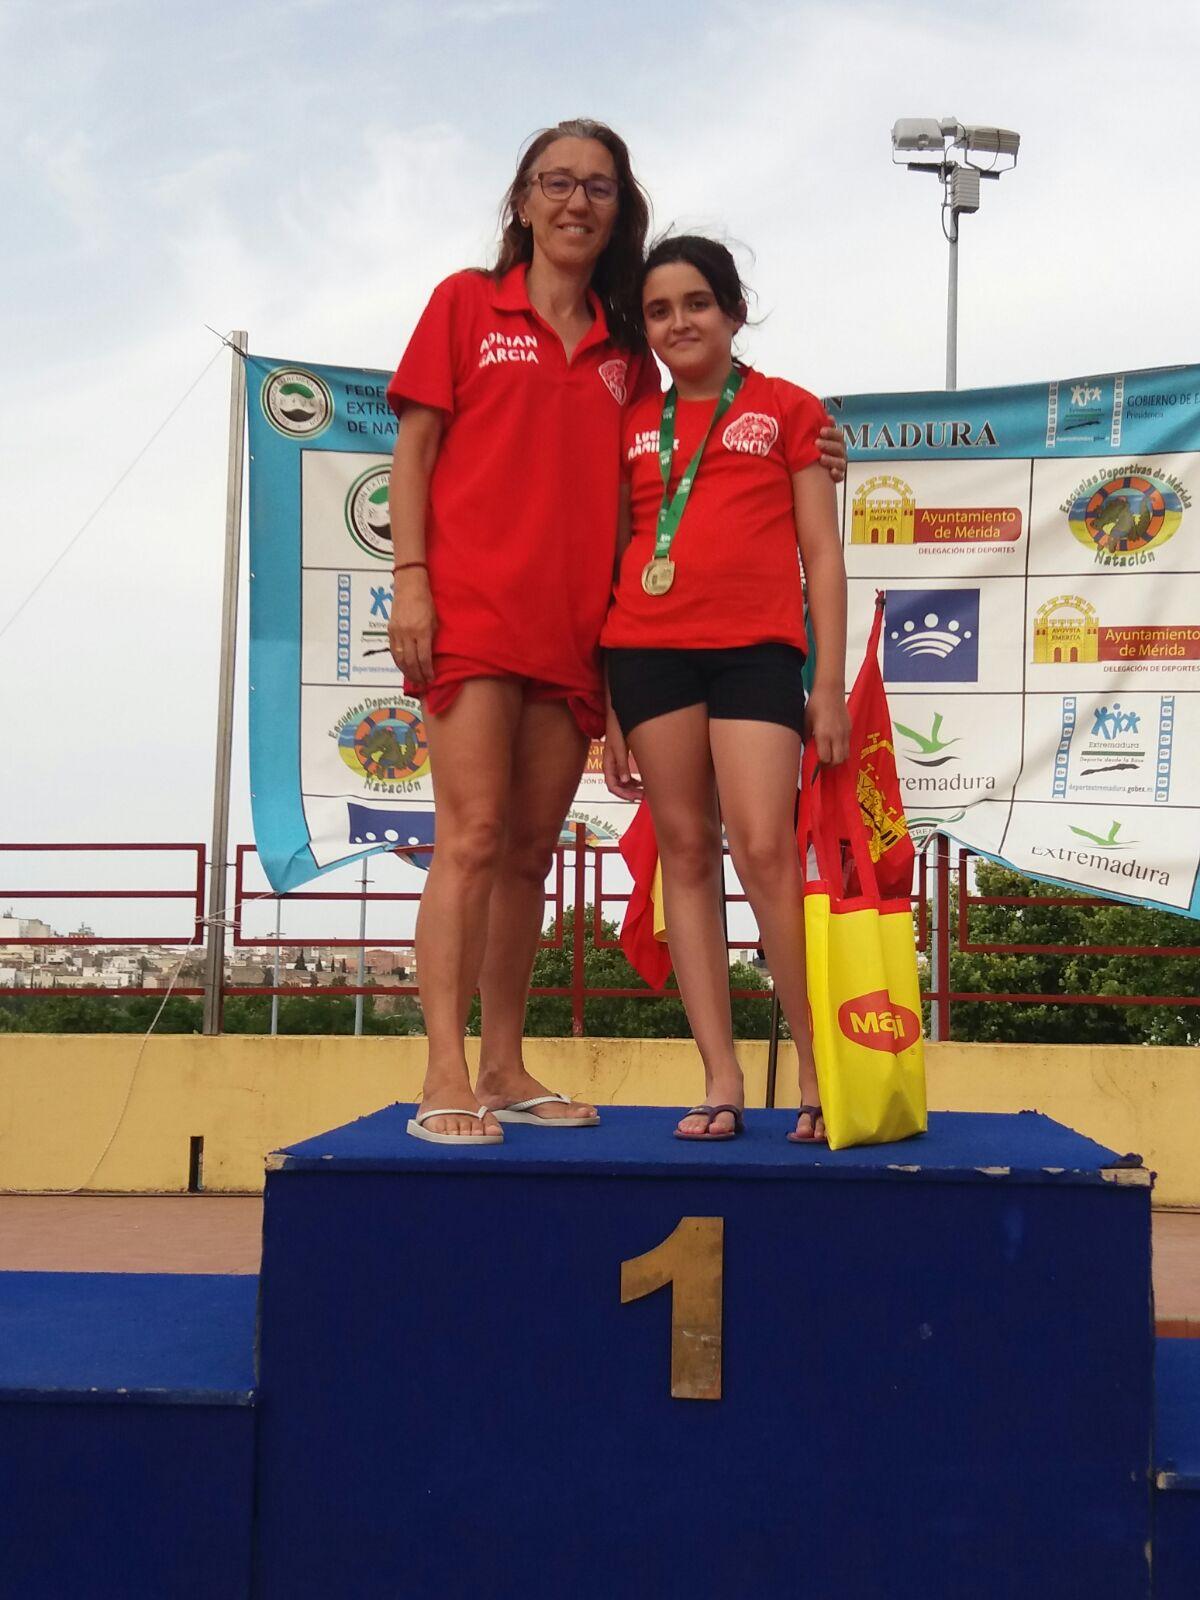 Escuela de natacion piscis for Piscina climatizada navalmoral